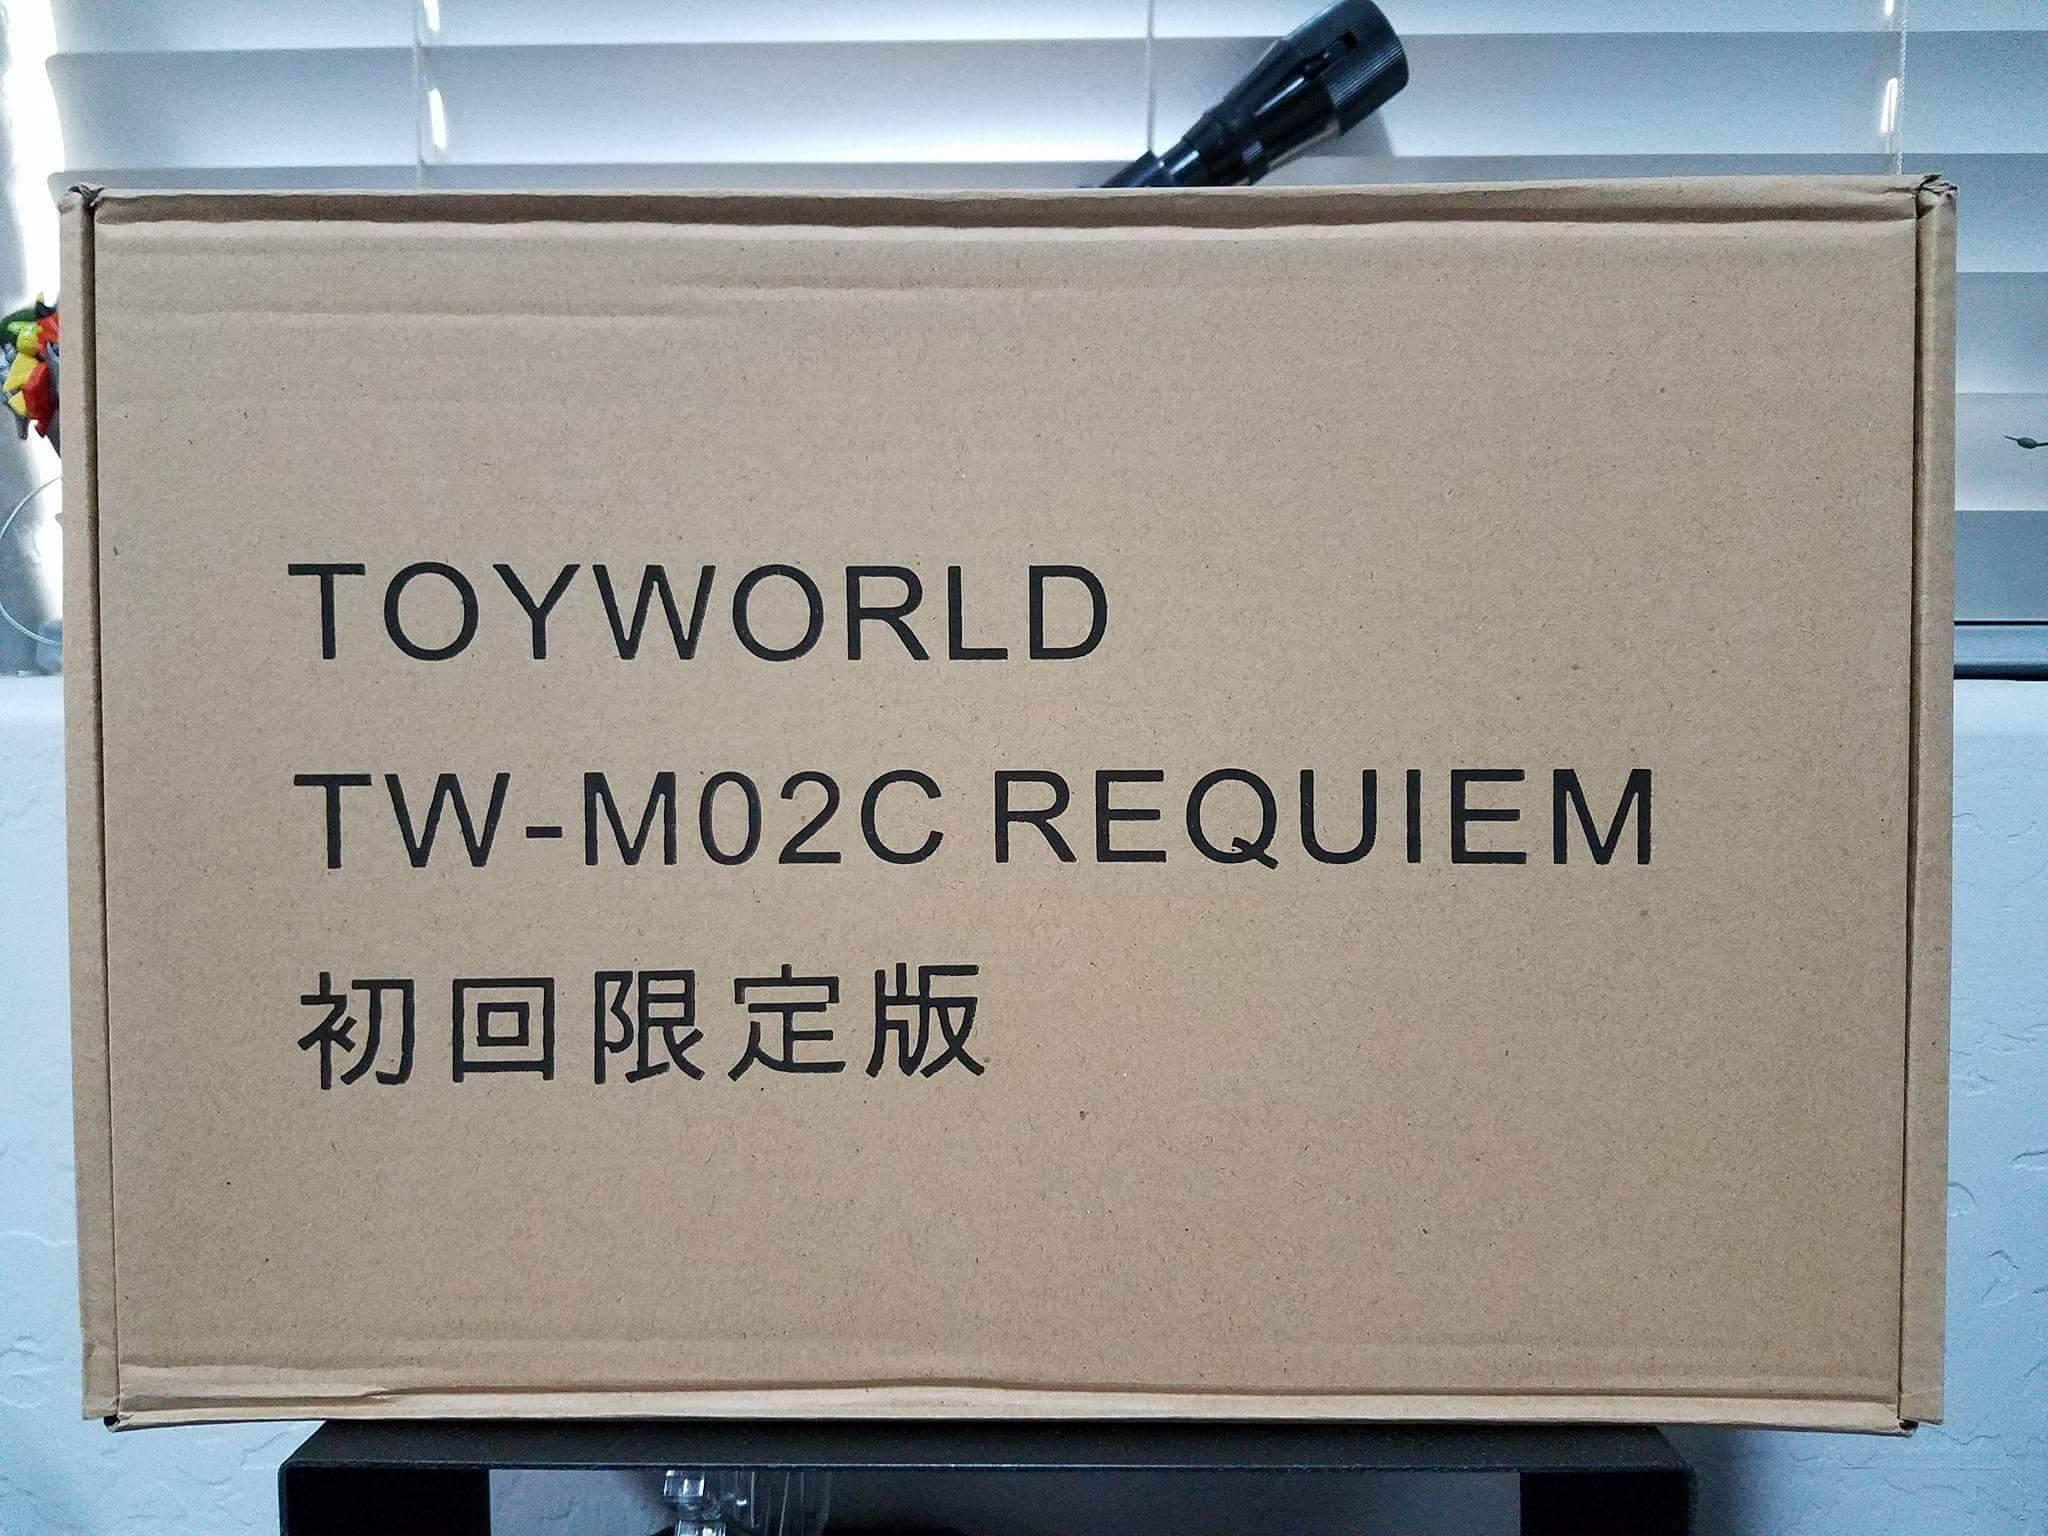 [ToyWorld] Produit Tiers - TW-M02A Combustor (Ramjet/Statoréacto), TW-M02B Assault (Thrust/Fatalo), TW-M02C Requiem (Dirge/Funébro) - Page 3 ErQG9yp1